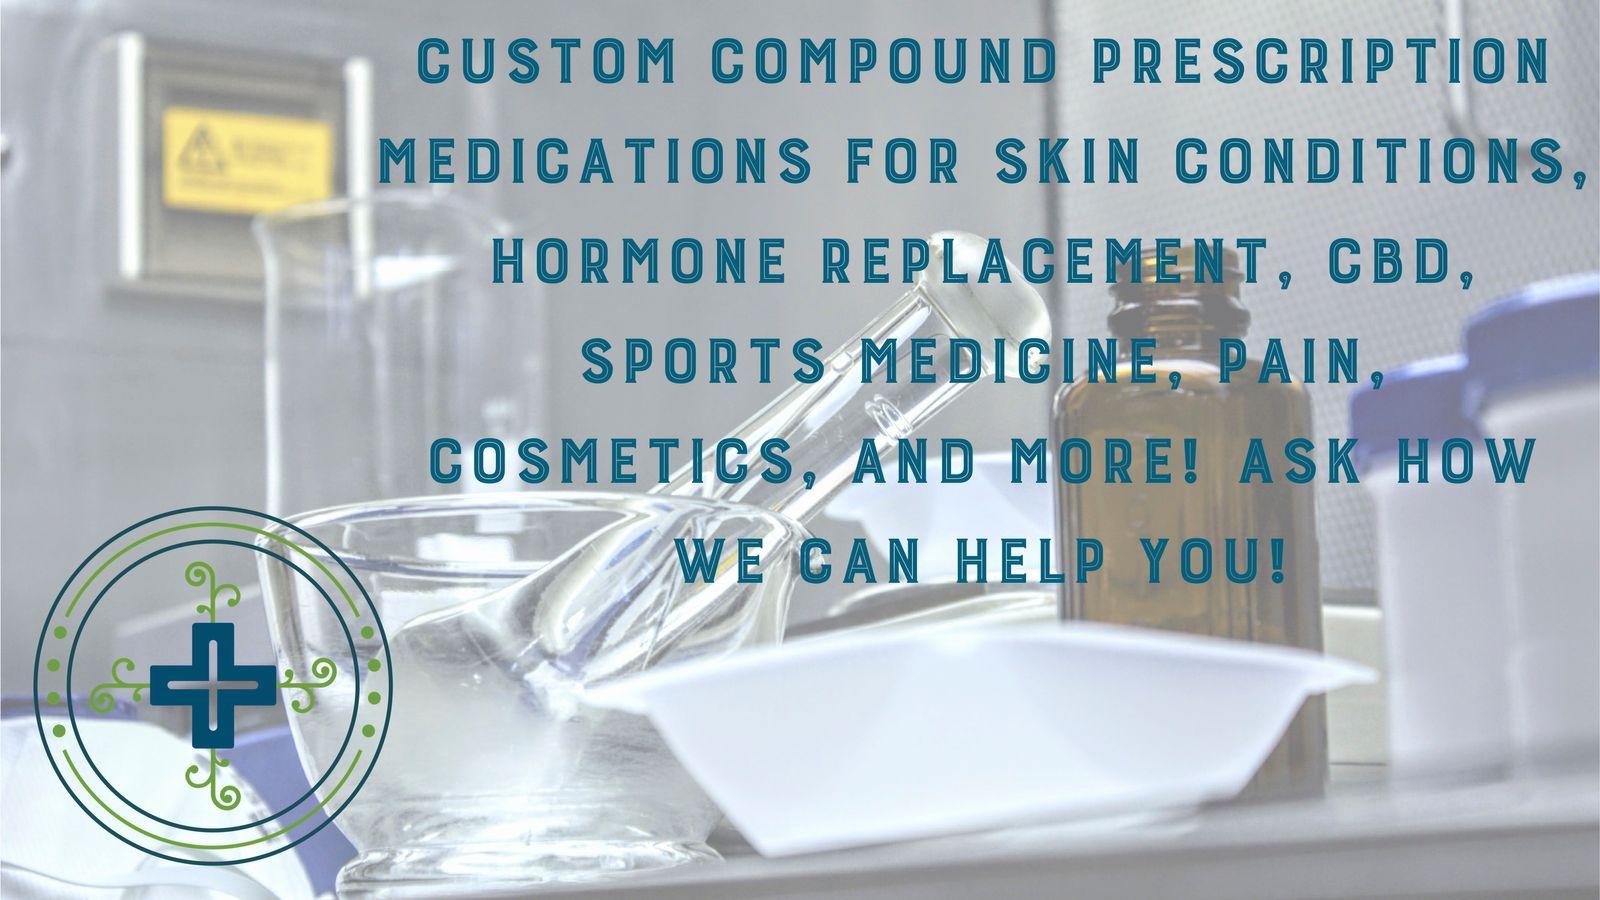 compounding_solace_pharmacy_custom_prescriptions_pharmacist.jpg